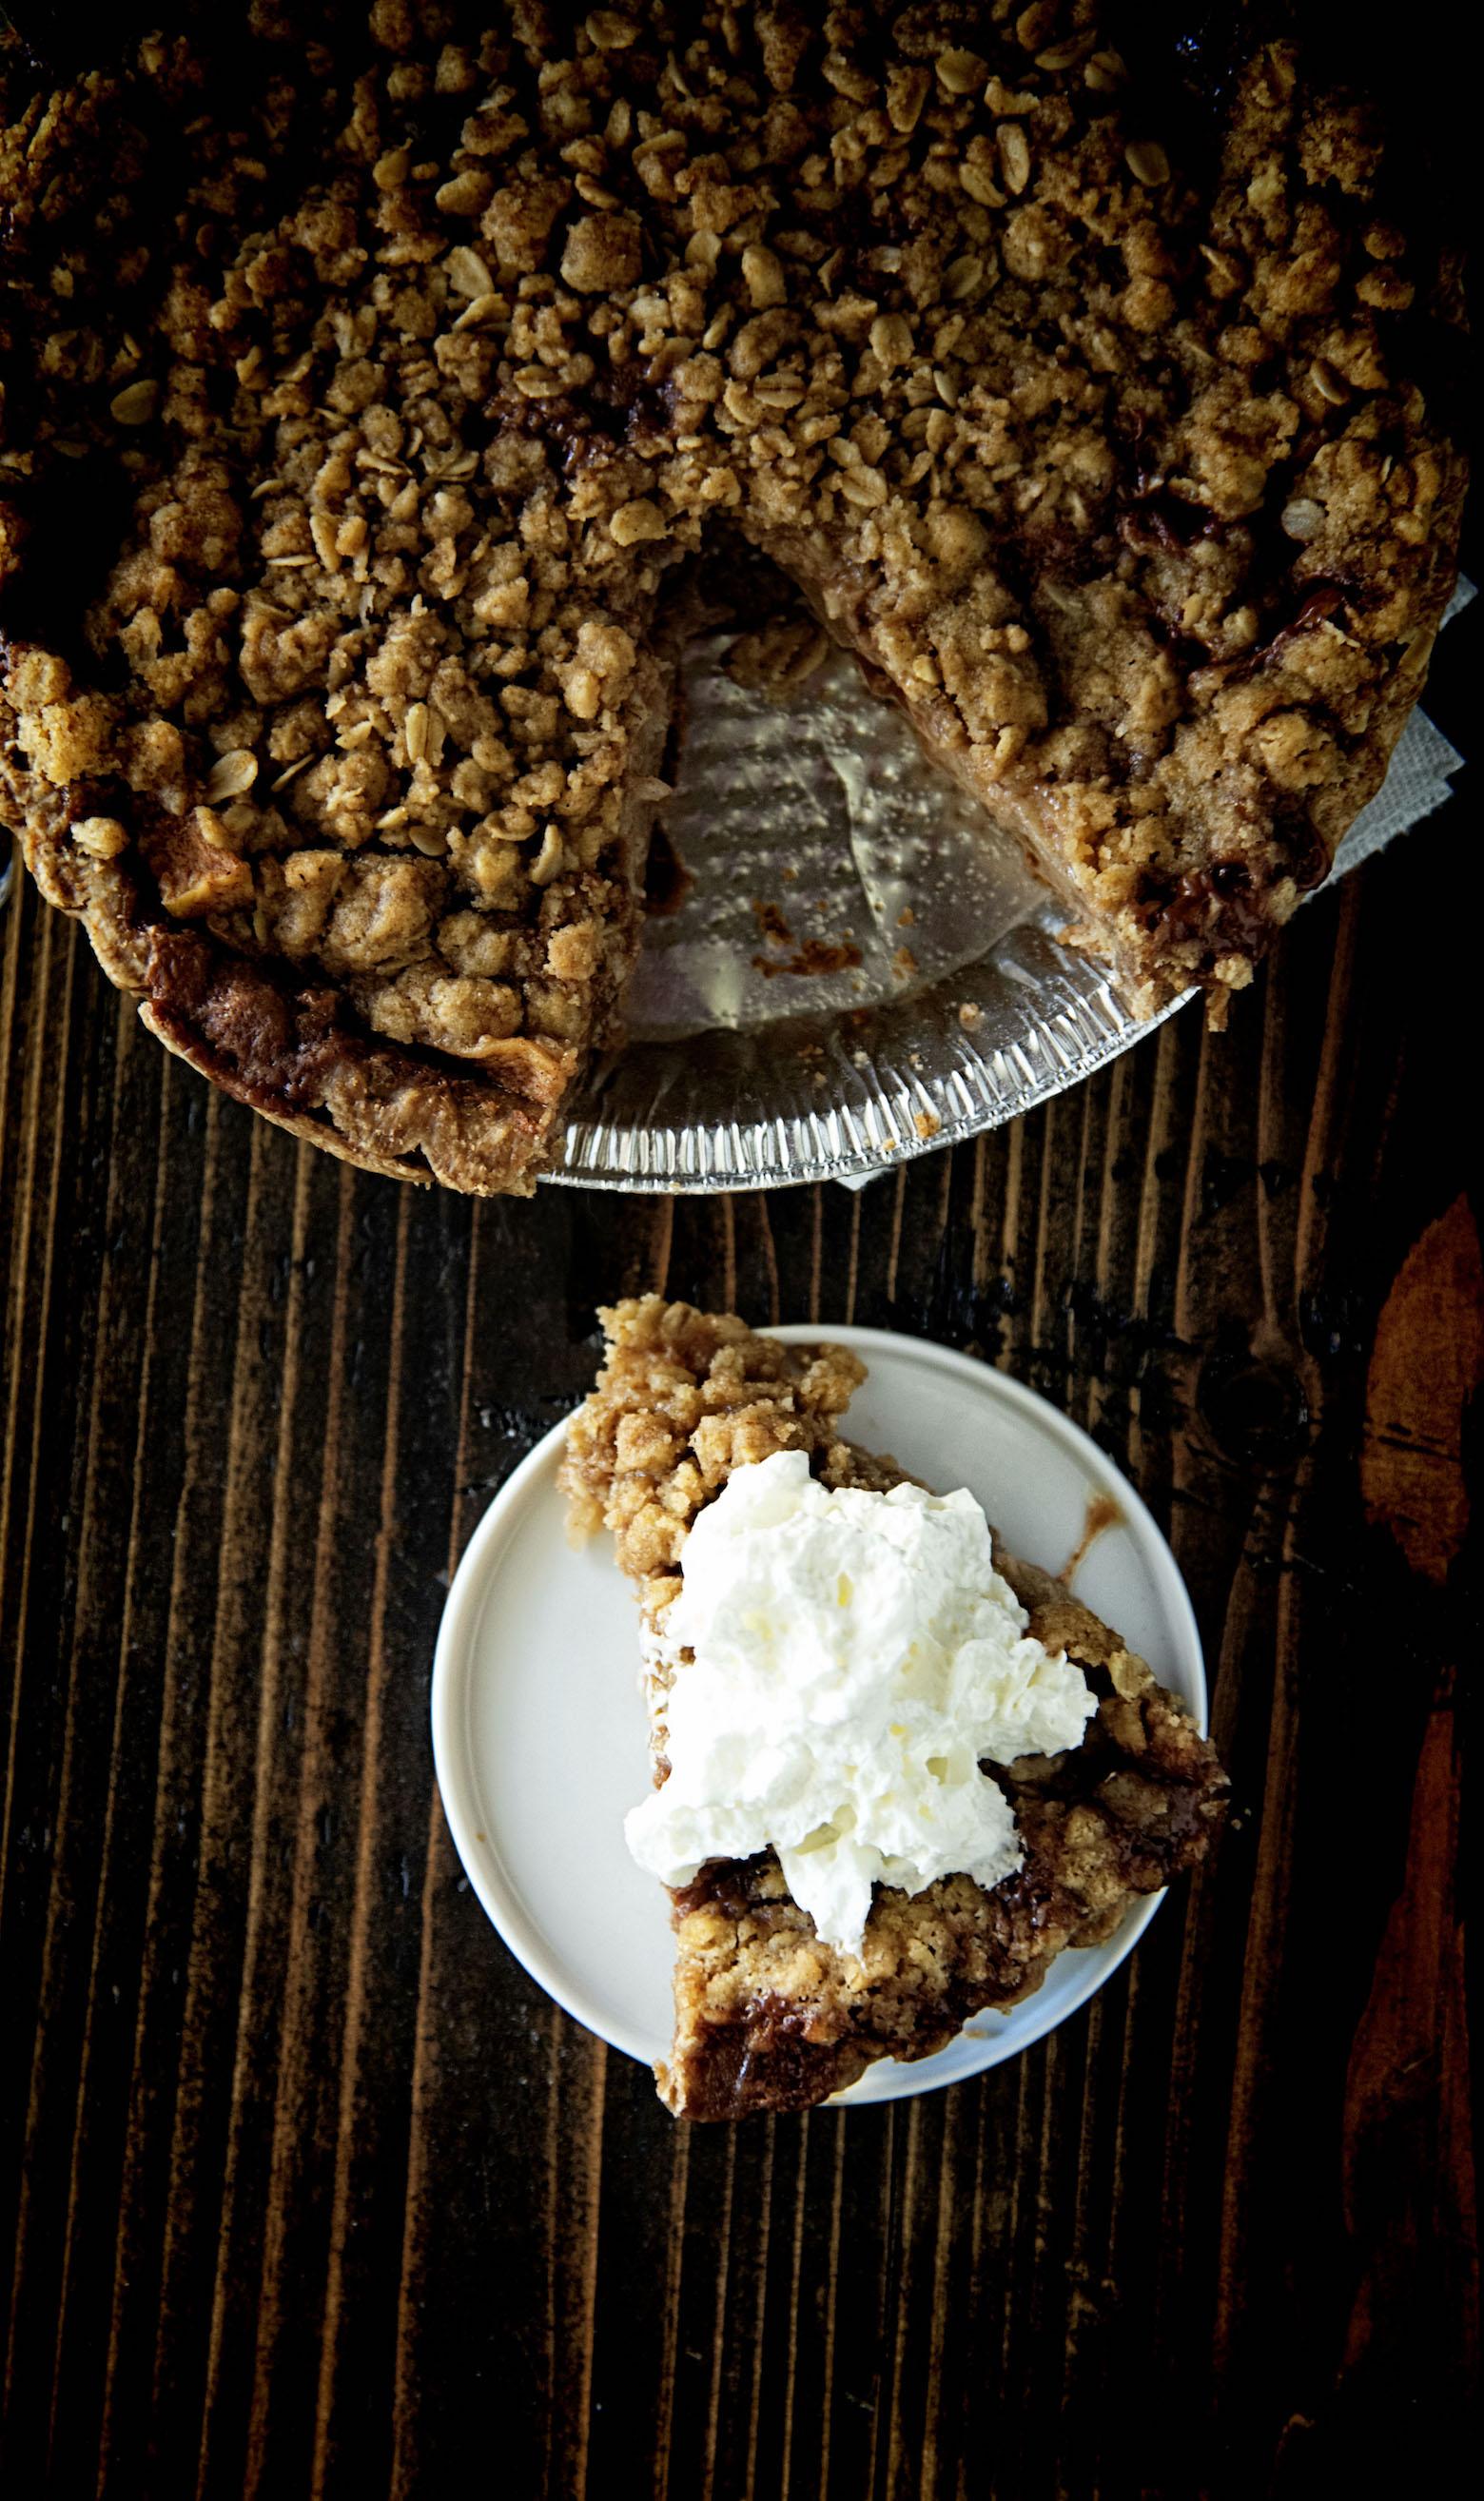 Oatmeal Crumble Caramel Apple Pie